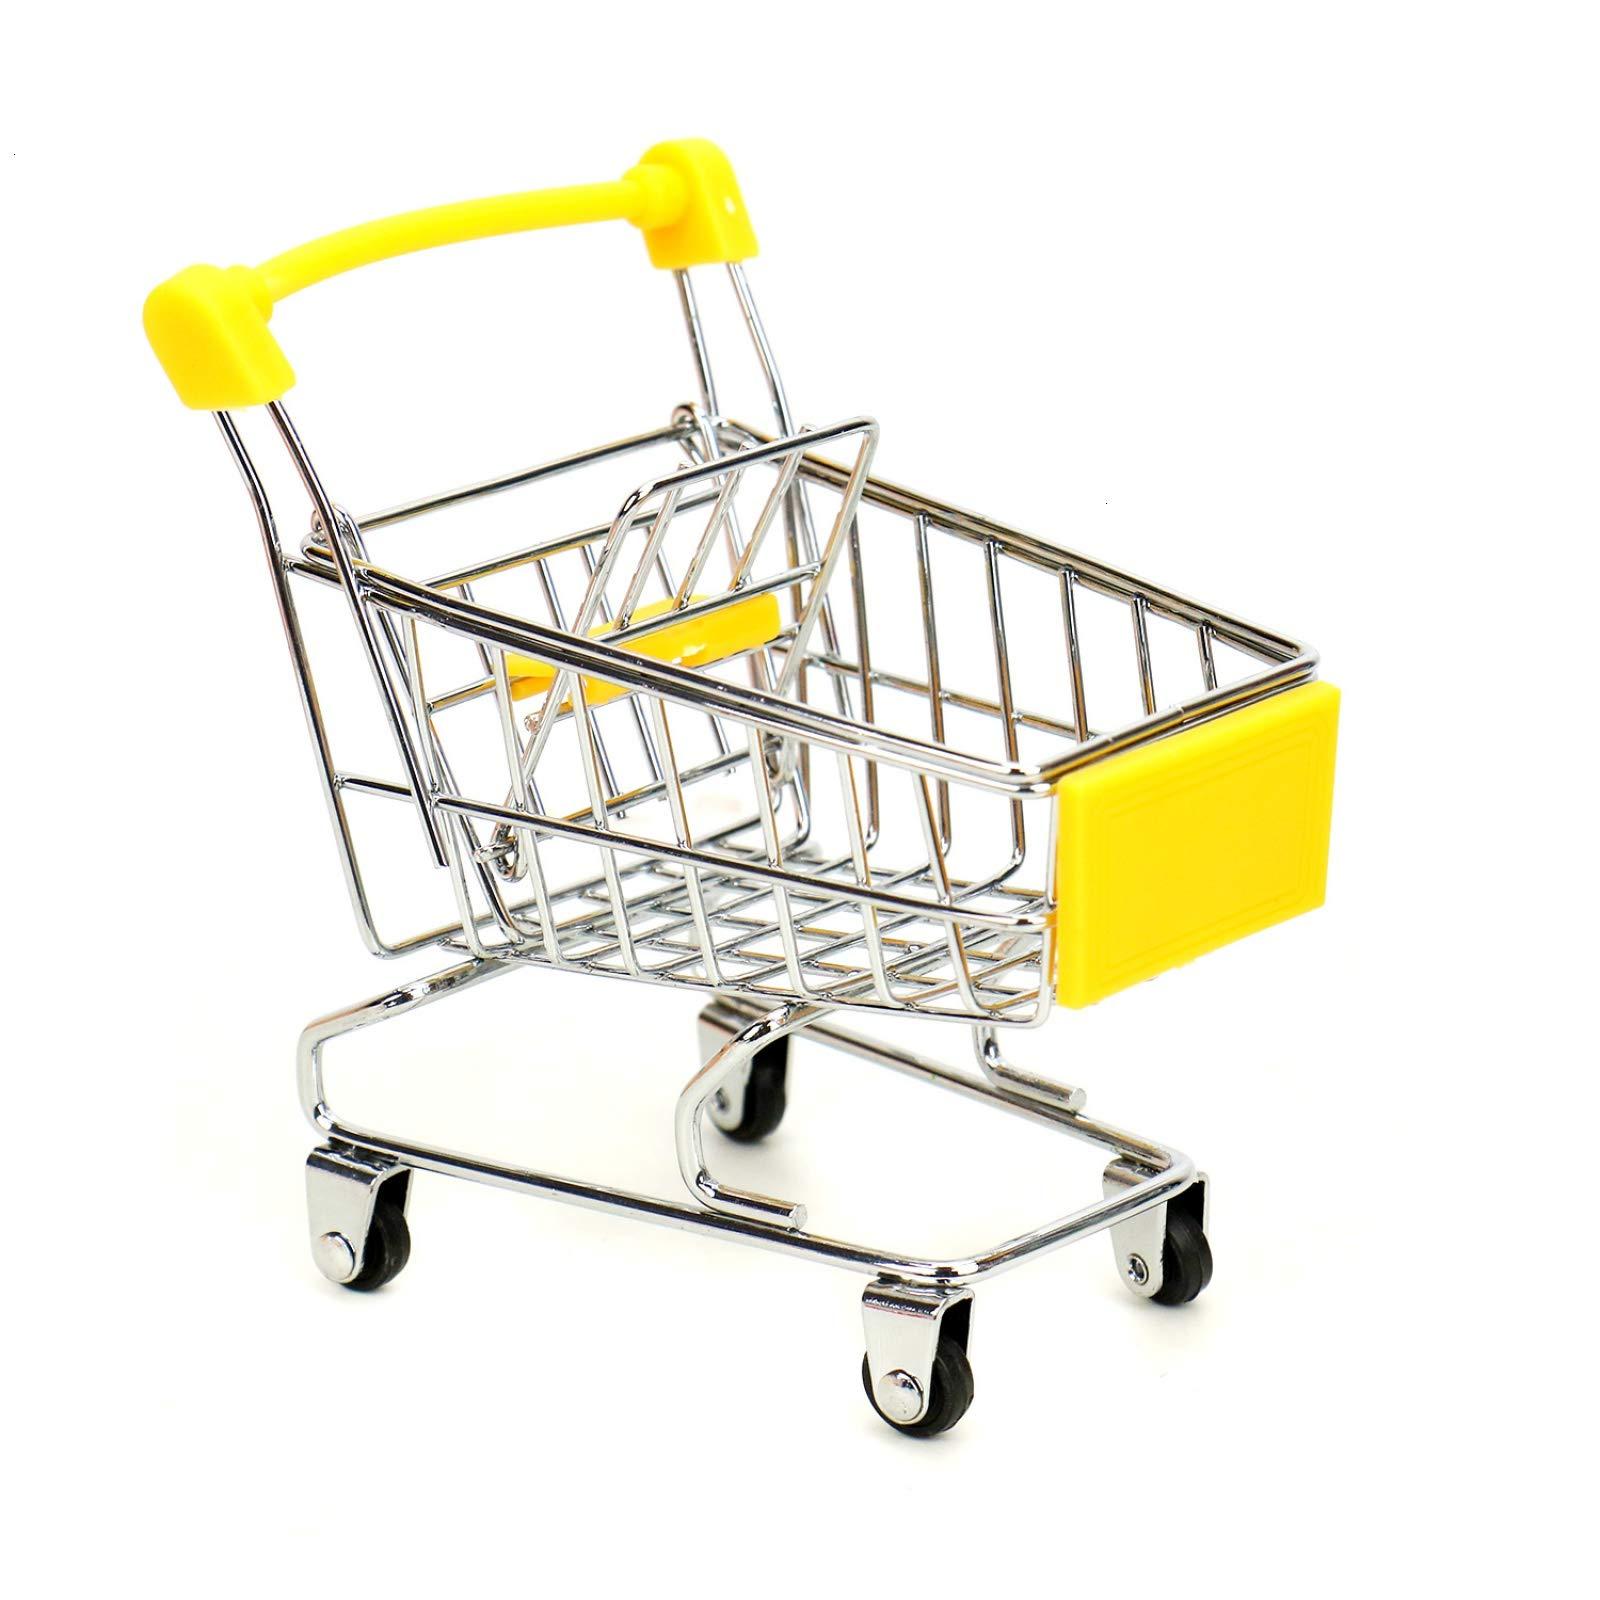 WSSROGY 3 Pack Mini Supermarket Handcart Cart Mode Storage Toy Table Office Novelty Decoration by WSSROGY (Image #4)